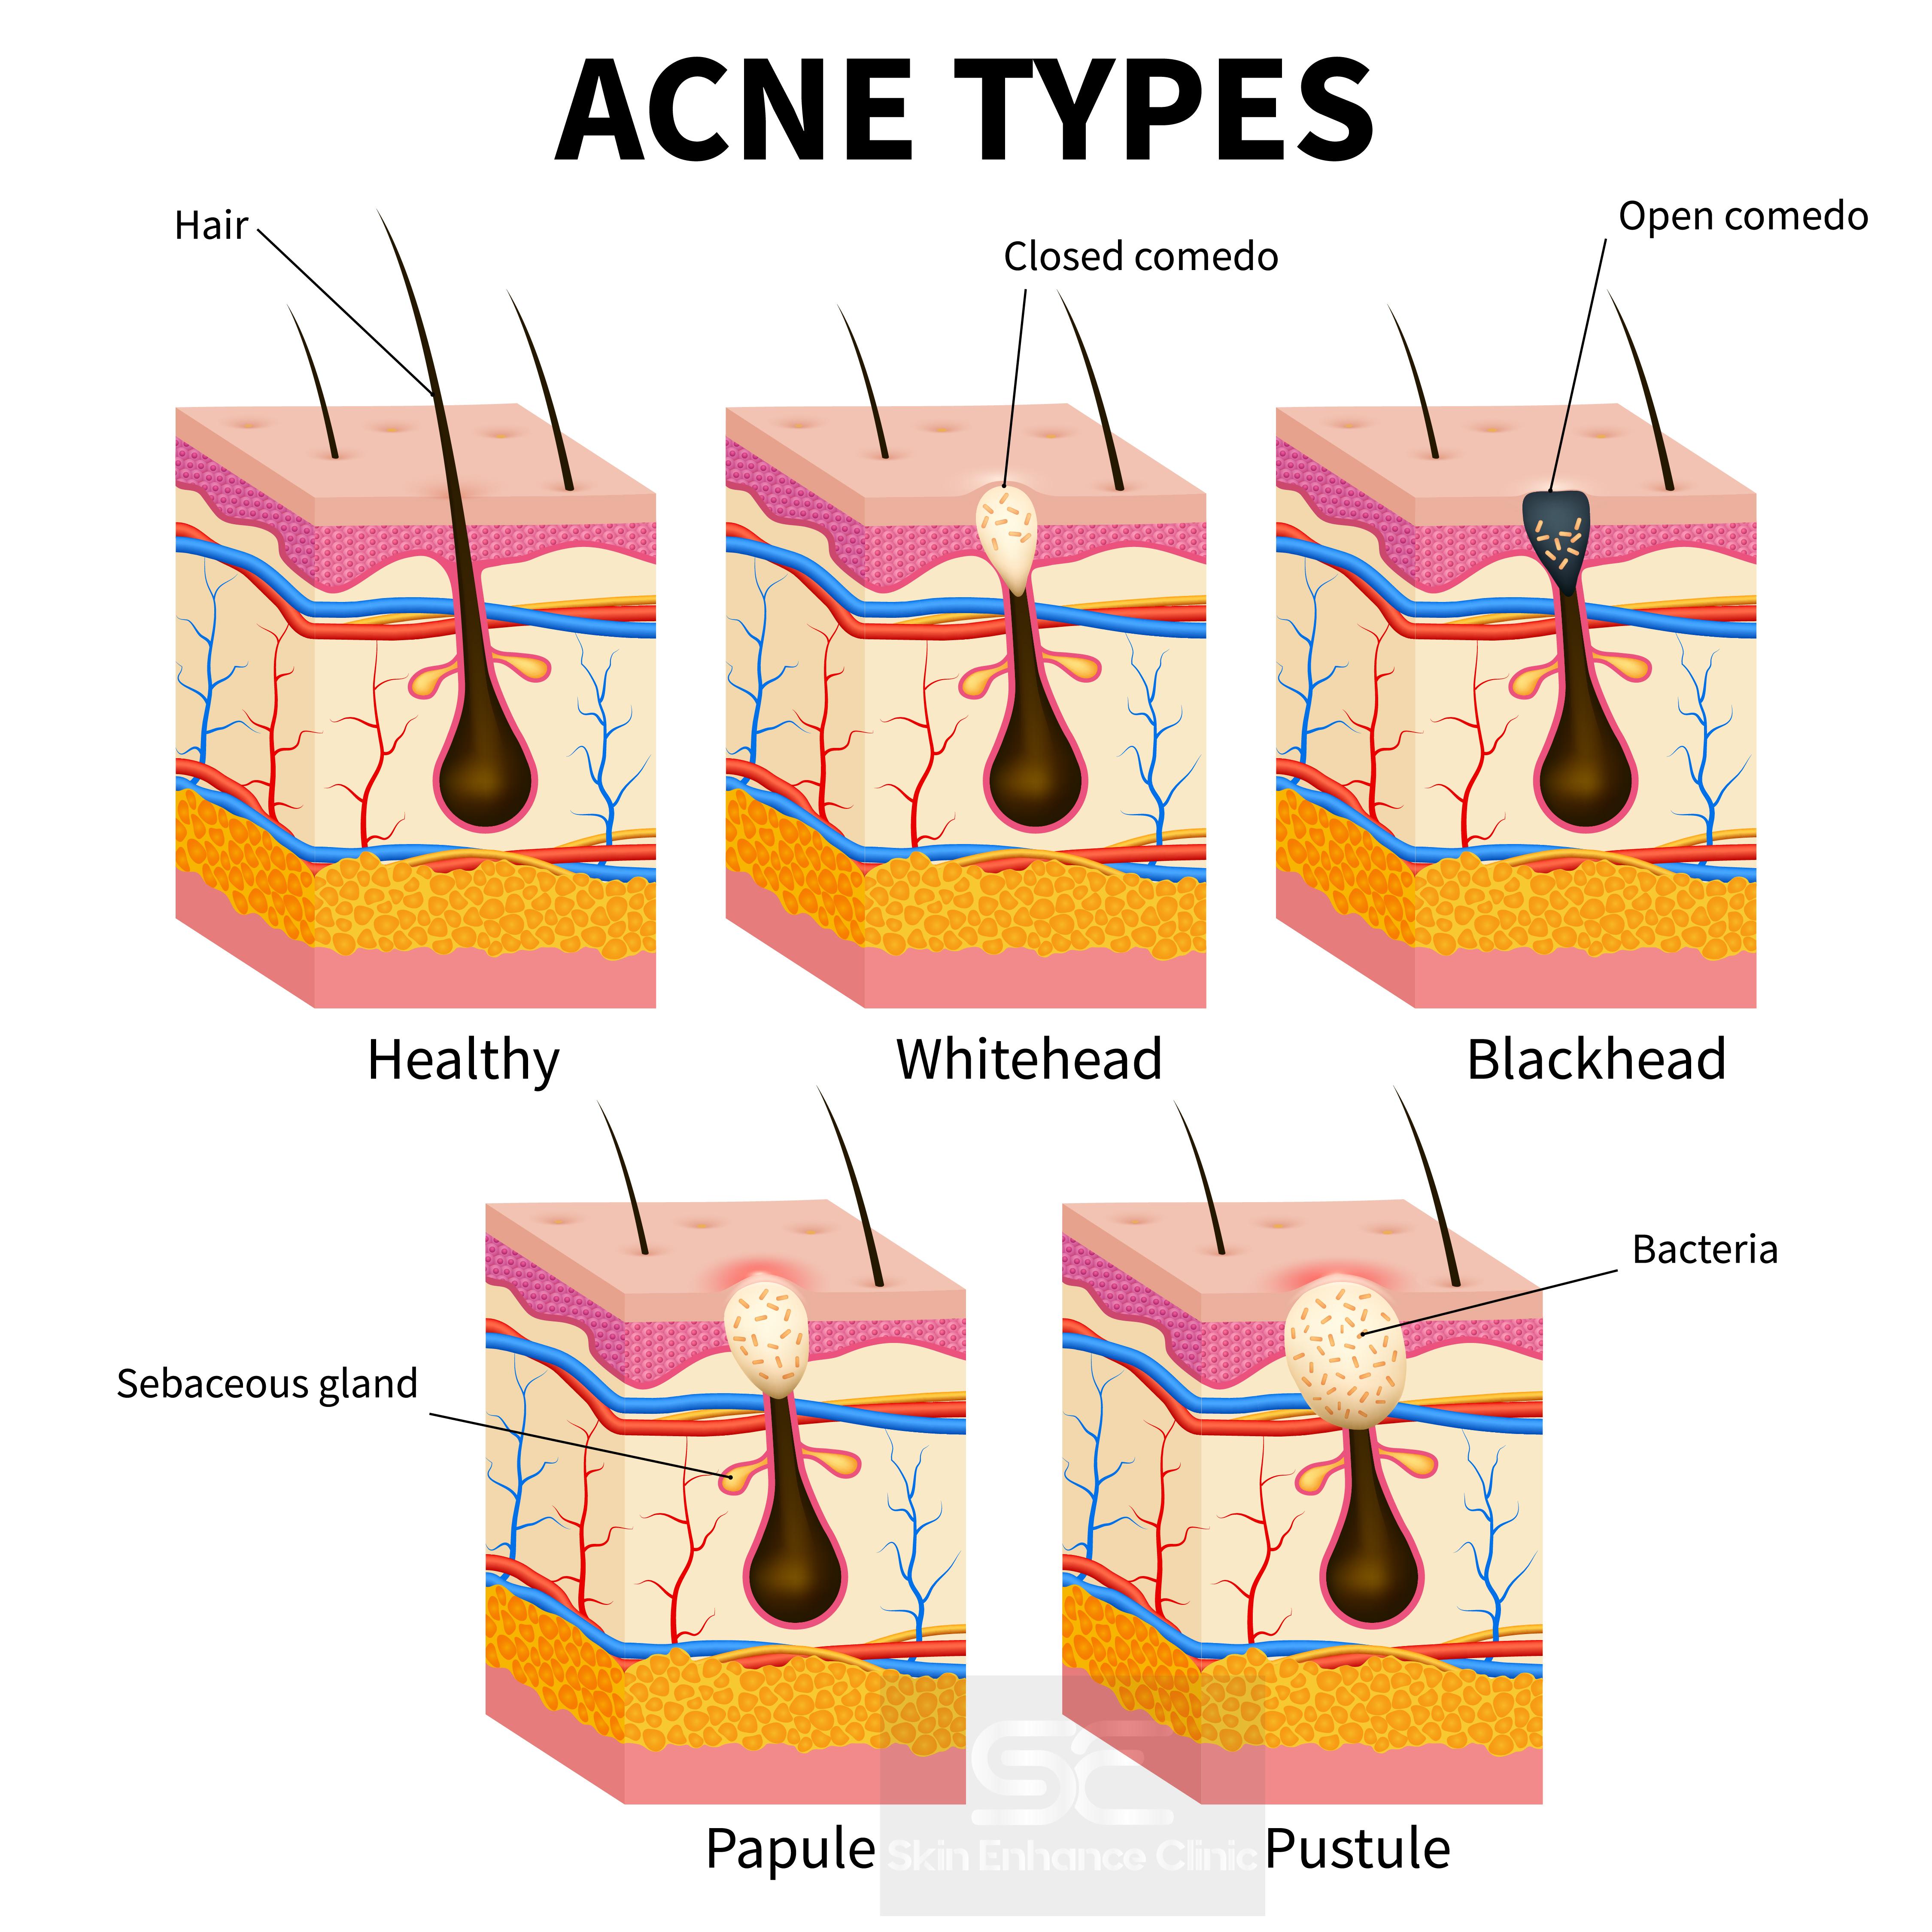 Dr Tash Blogs acne whitehead blackhead papule pustule